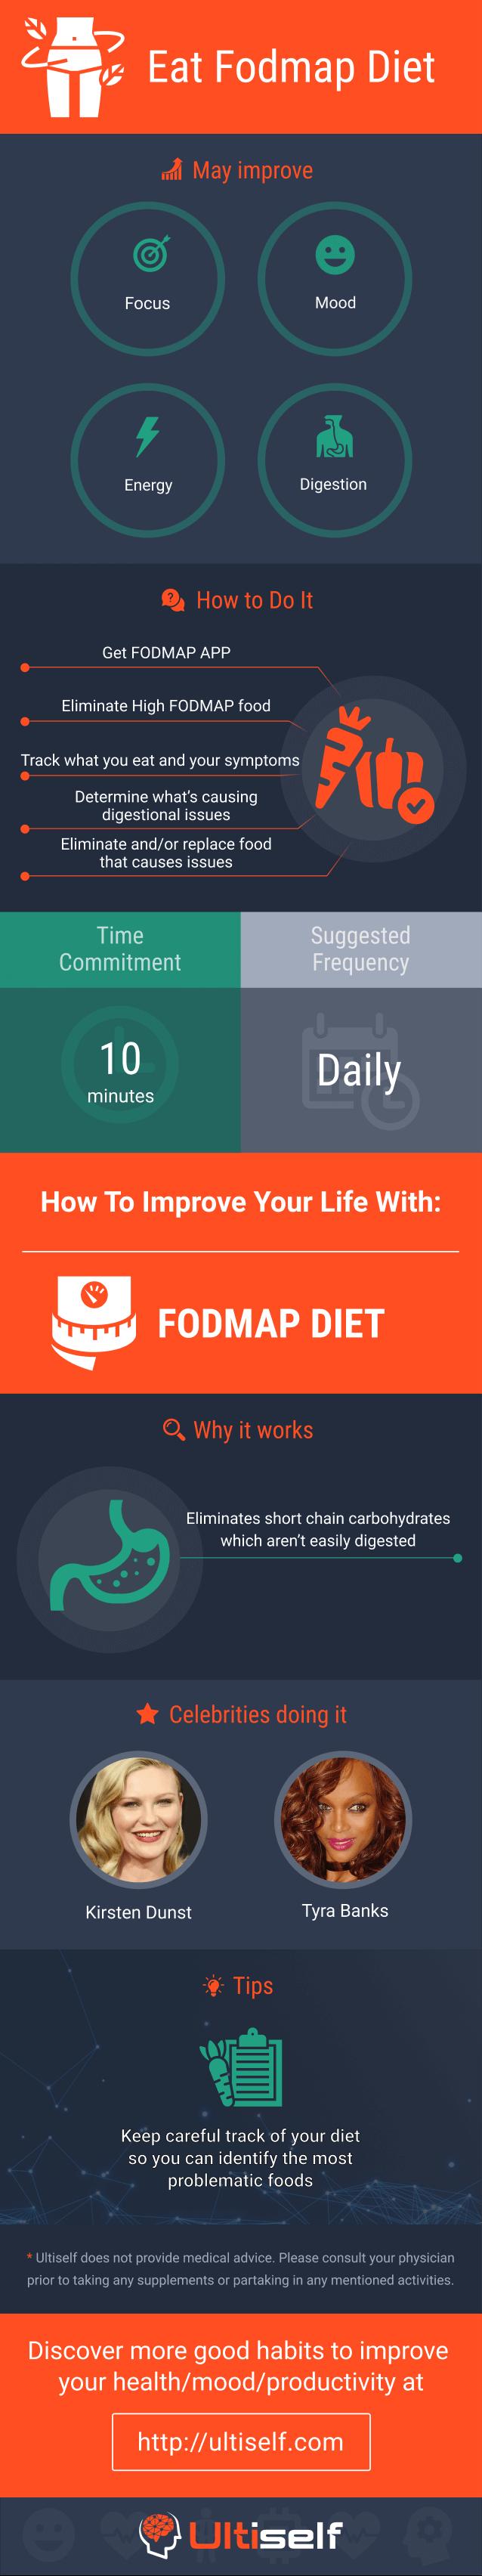 Eat FODMAP Diet infographic